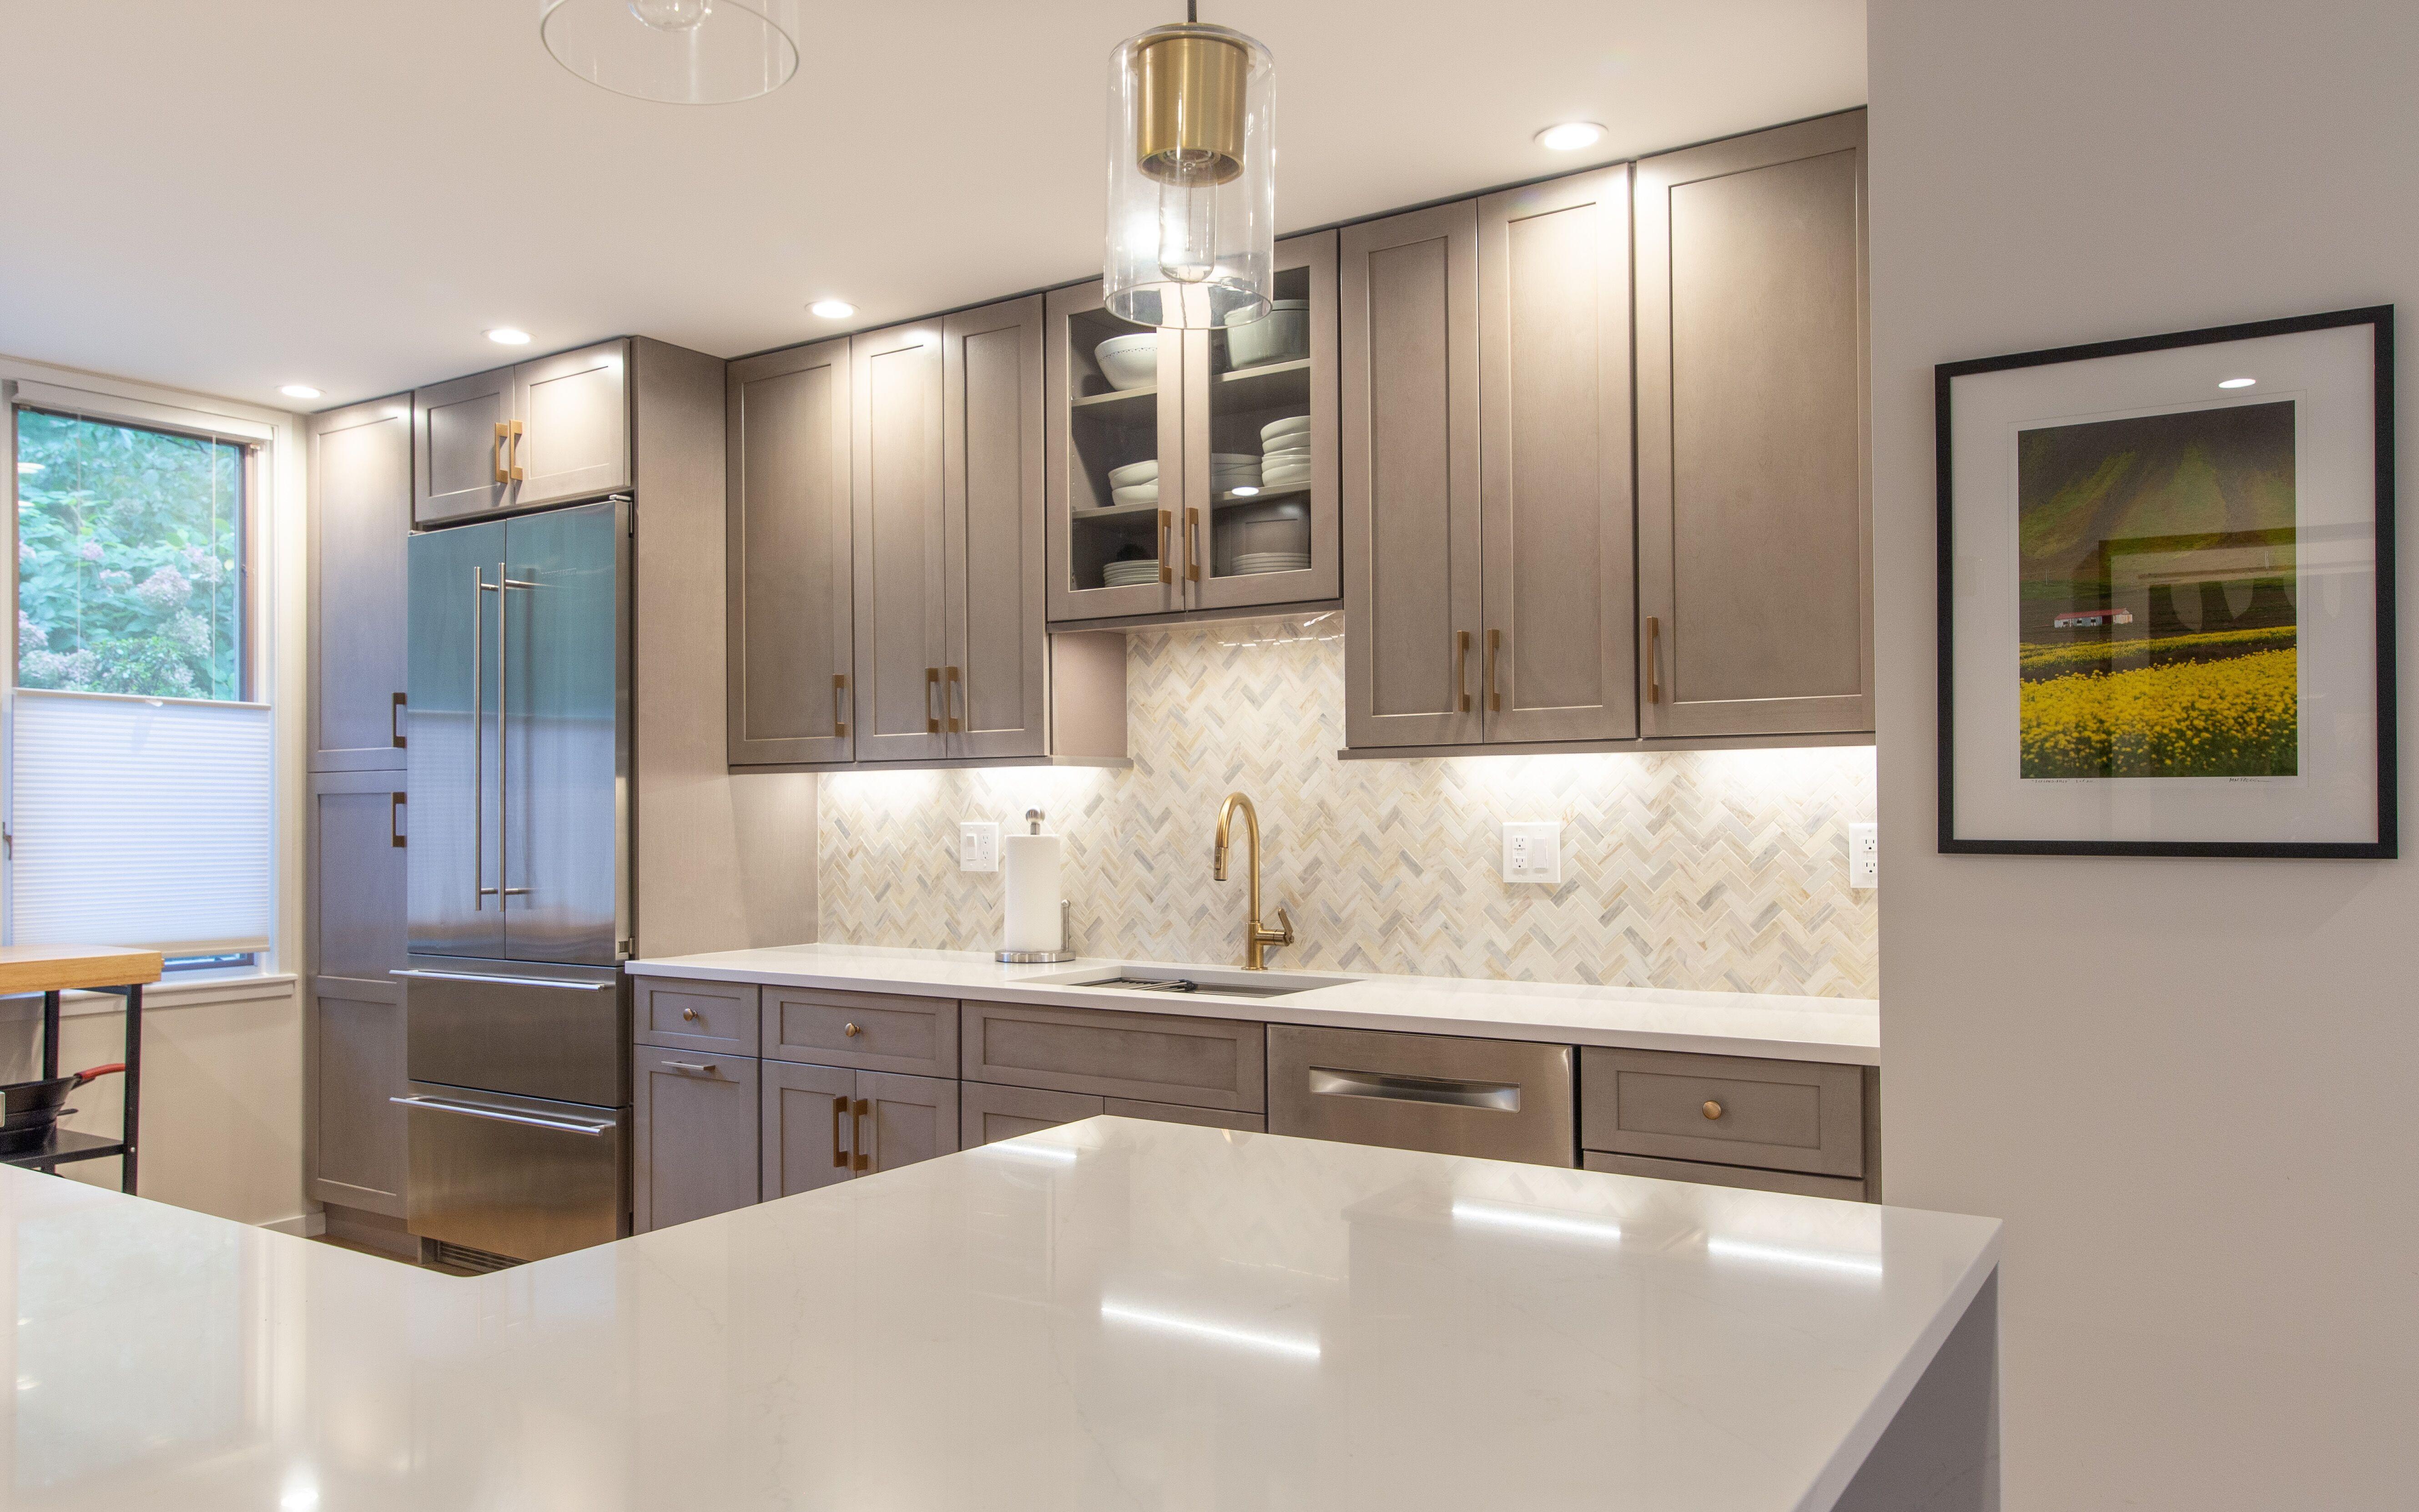 Grey Shaker Cabinetry Kitchen Cabinet Design Kitchen Remodel Kitchen And Bath Design